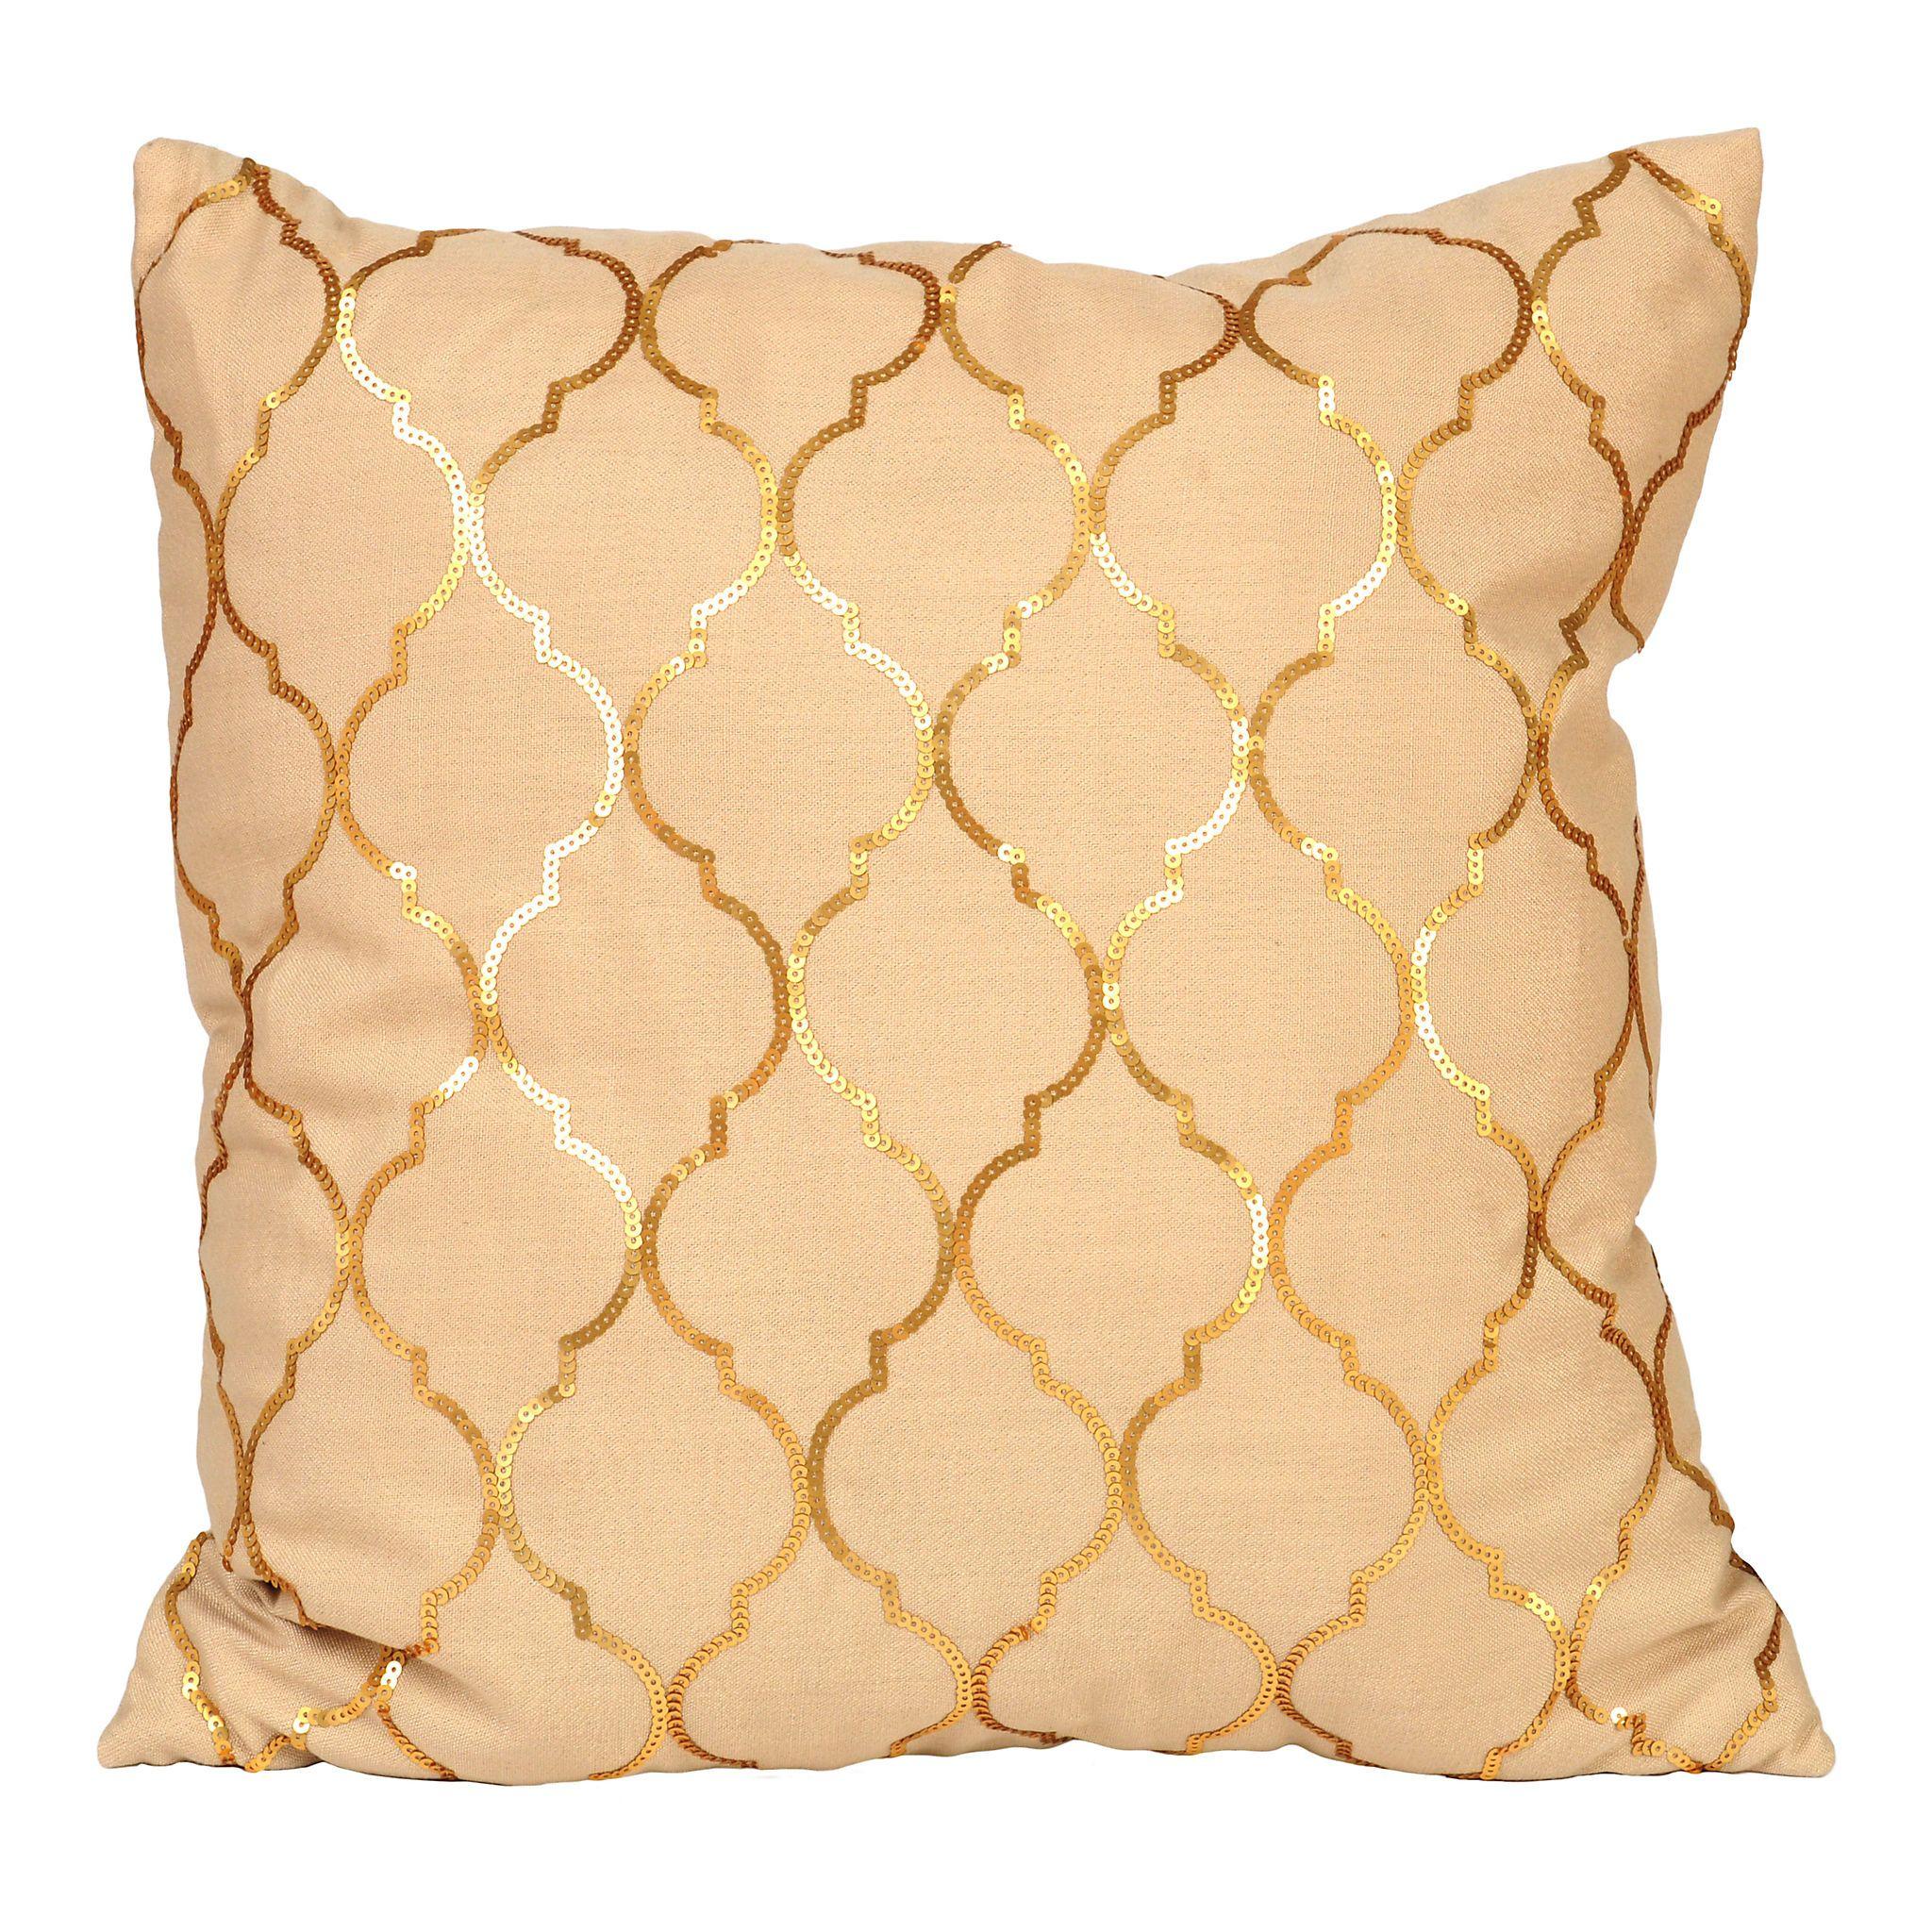 cushion rose bismillah image gold magic hafsacreates pillow sequin products cover